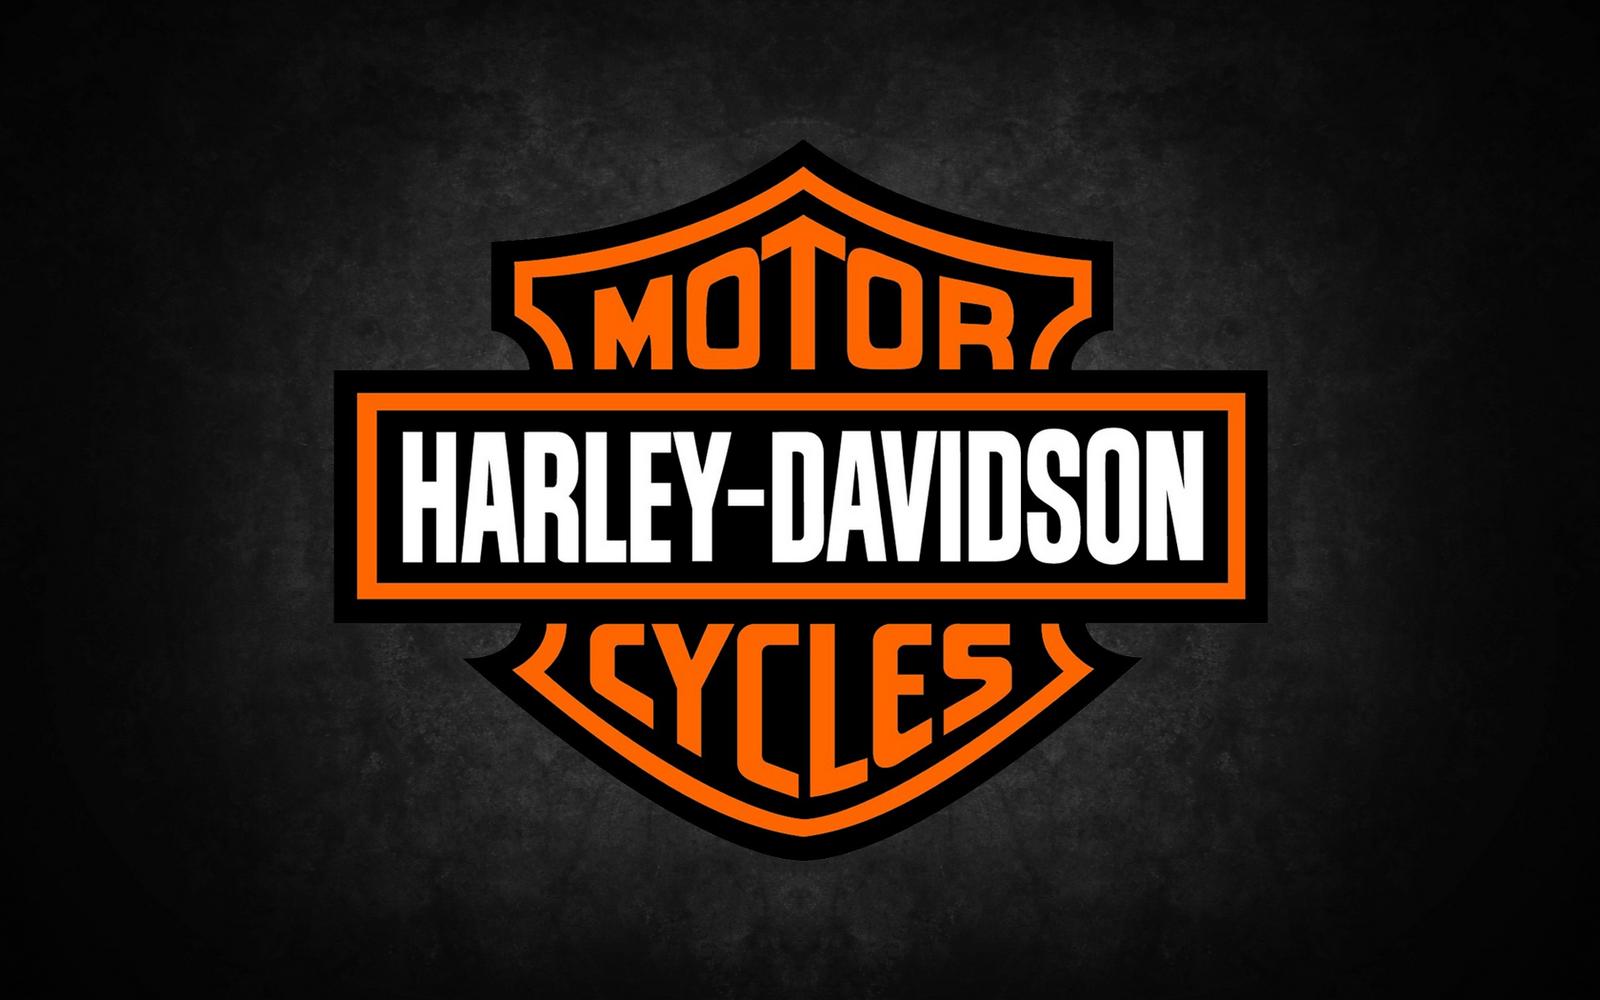 Upcoming Bike Harley Davidson Street 500 Full Specification Price